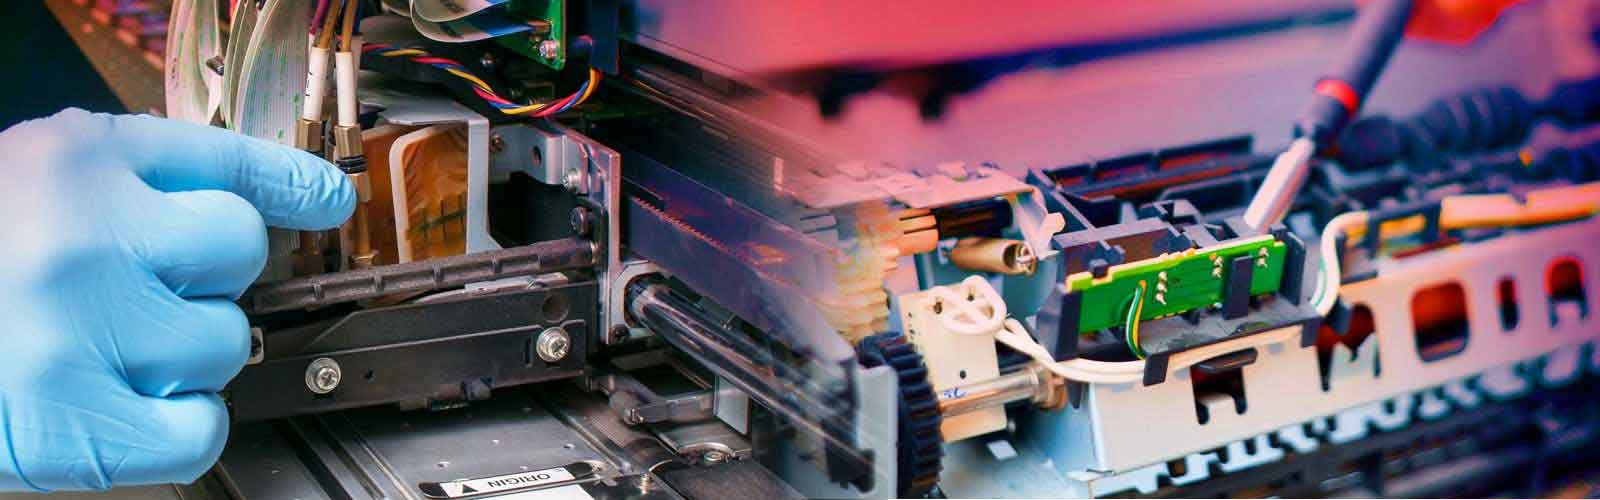 Reparación Impresoras, Plotter, Copiadoras. Todas Marcas